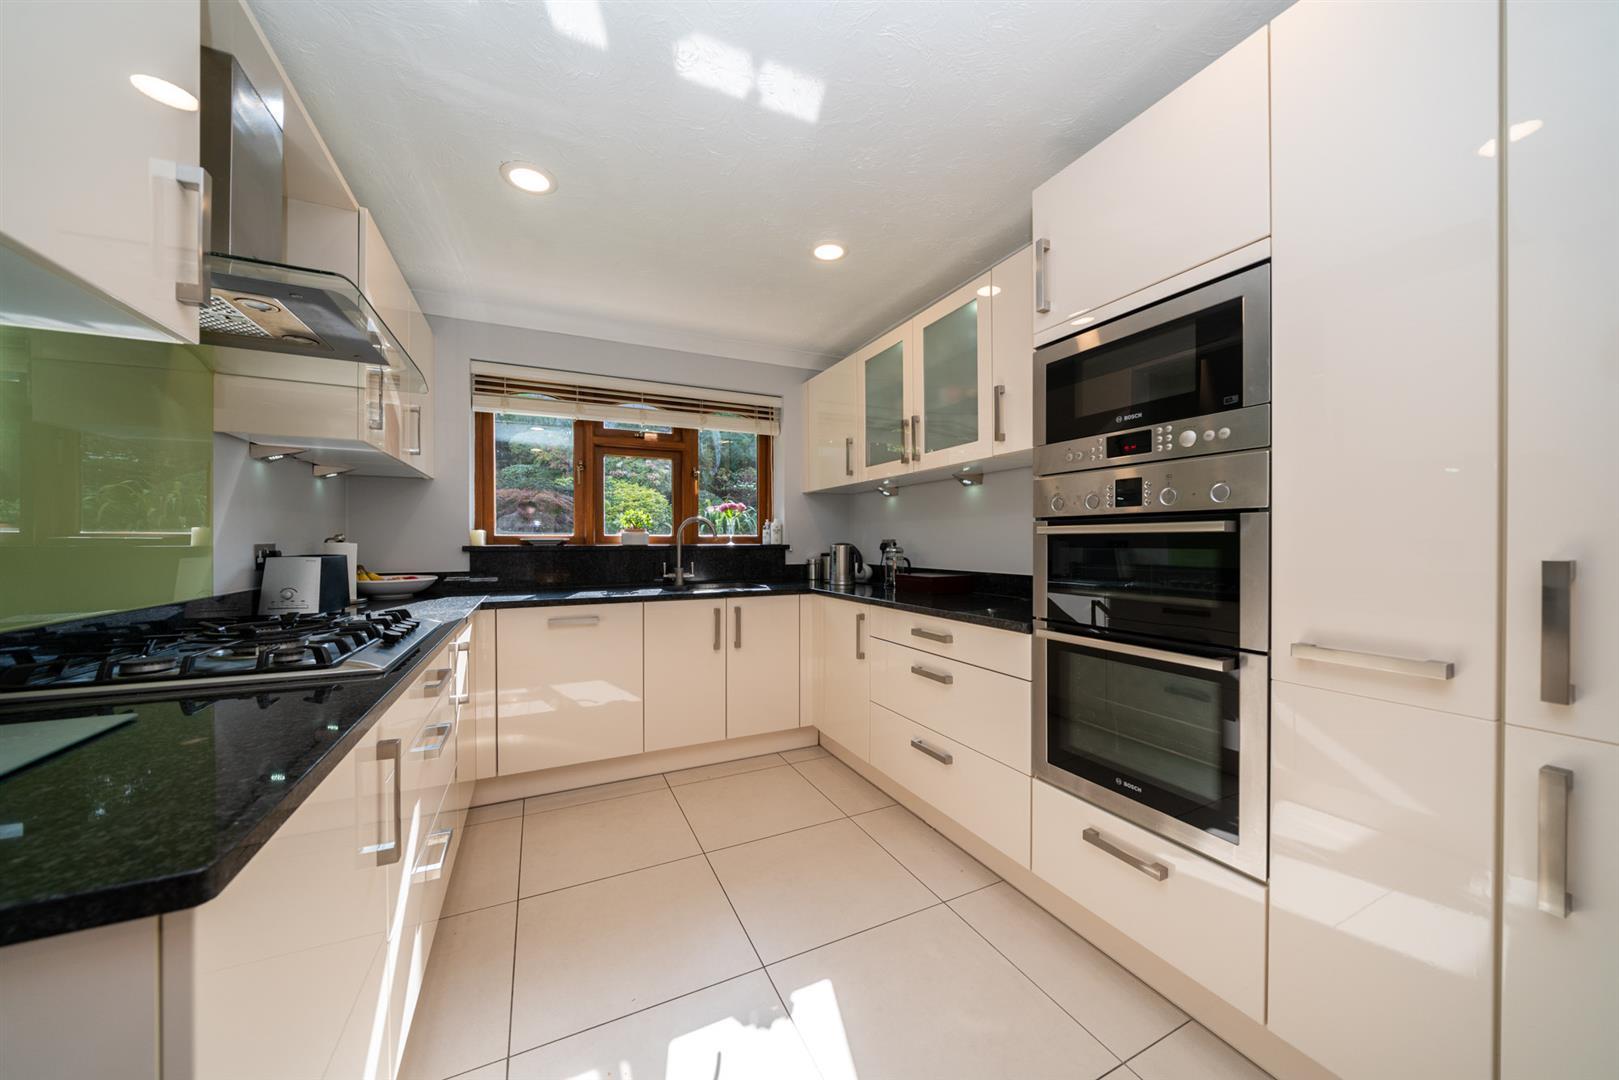 14-Larch-Rise-5404 - kitchen.jpg